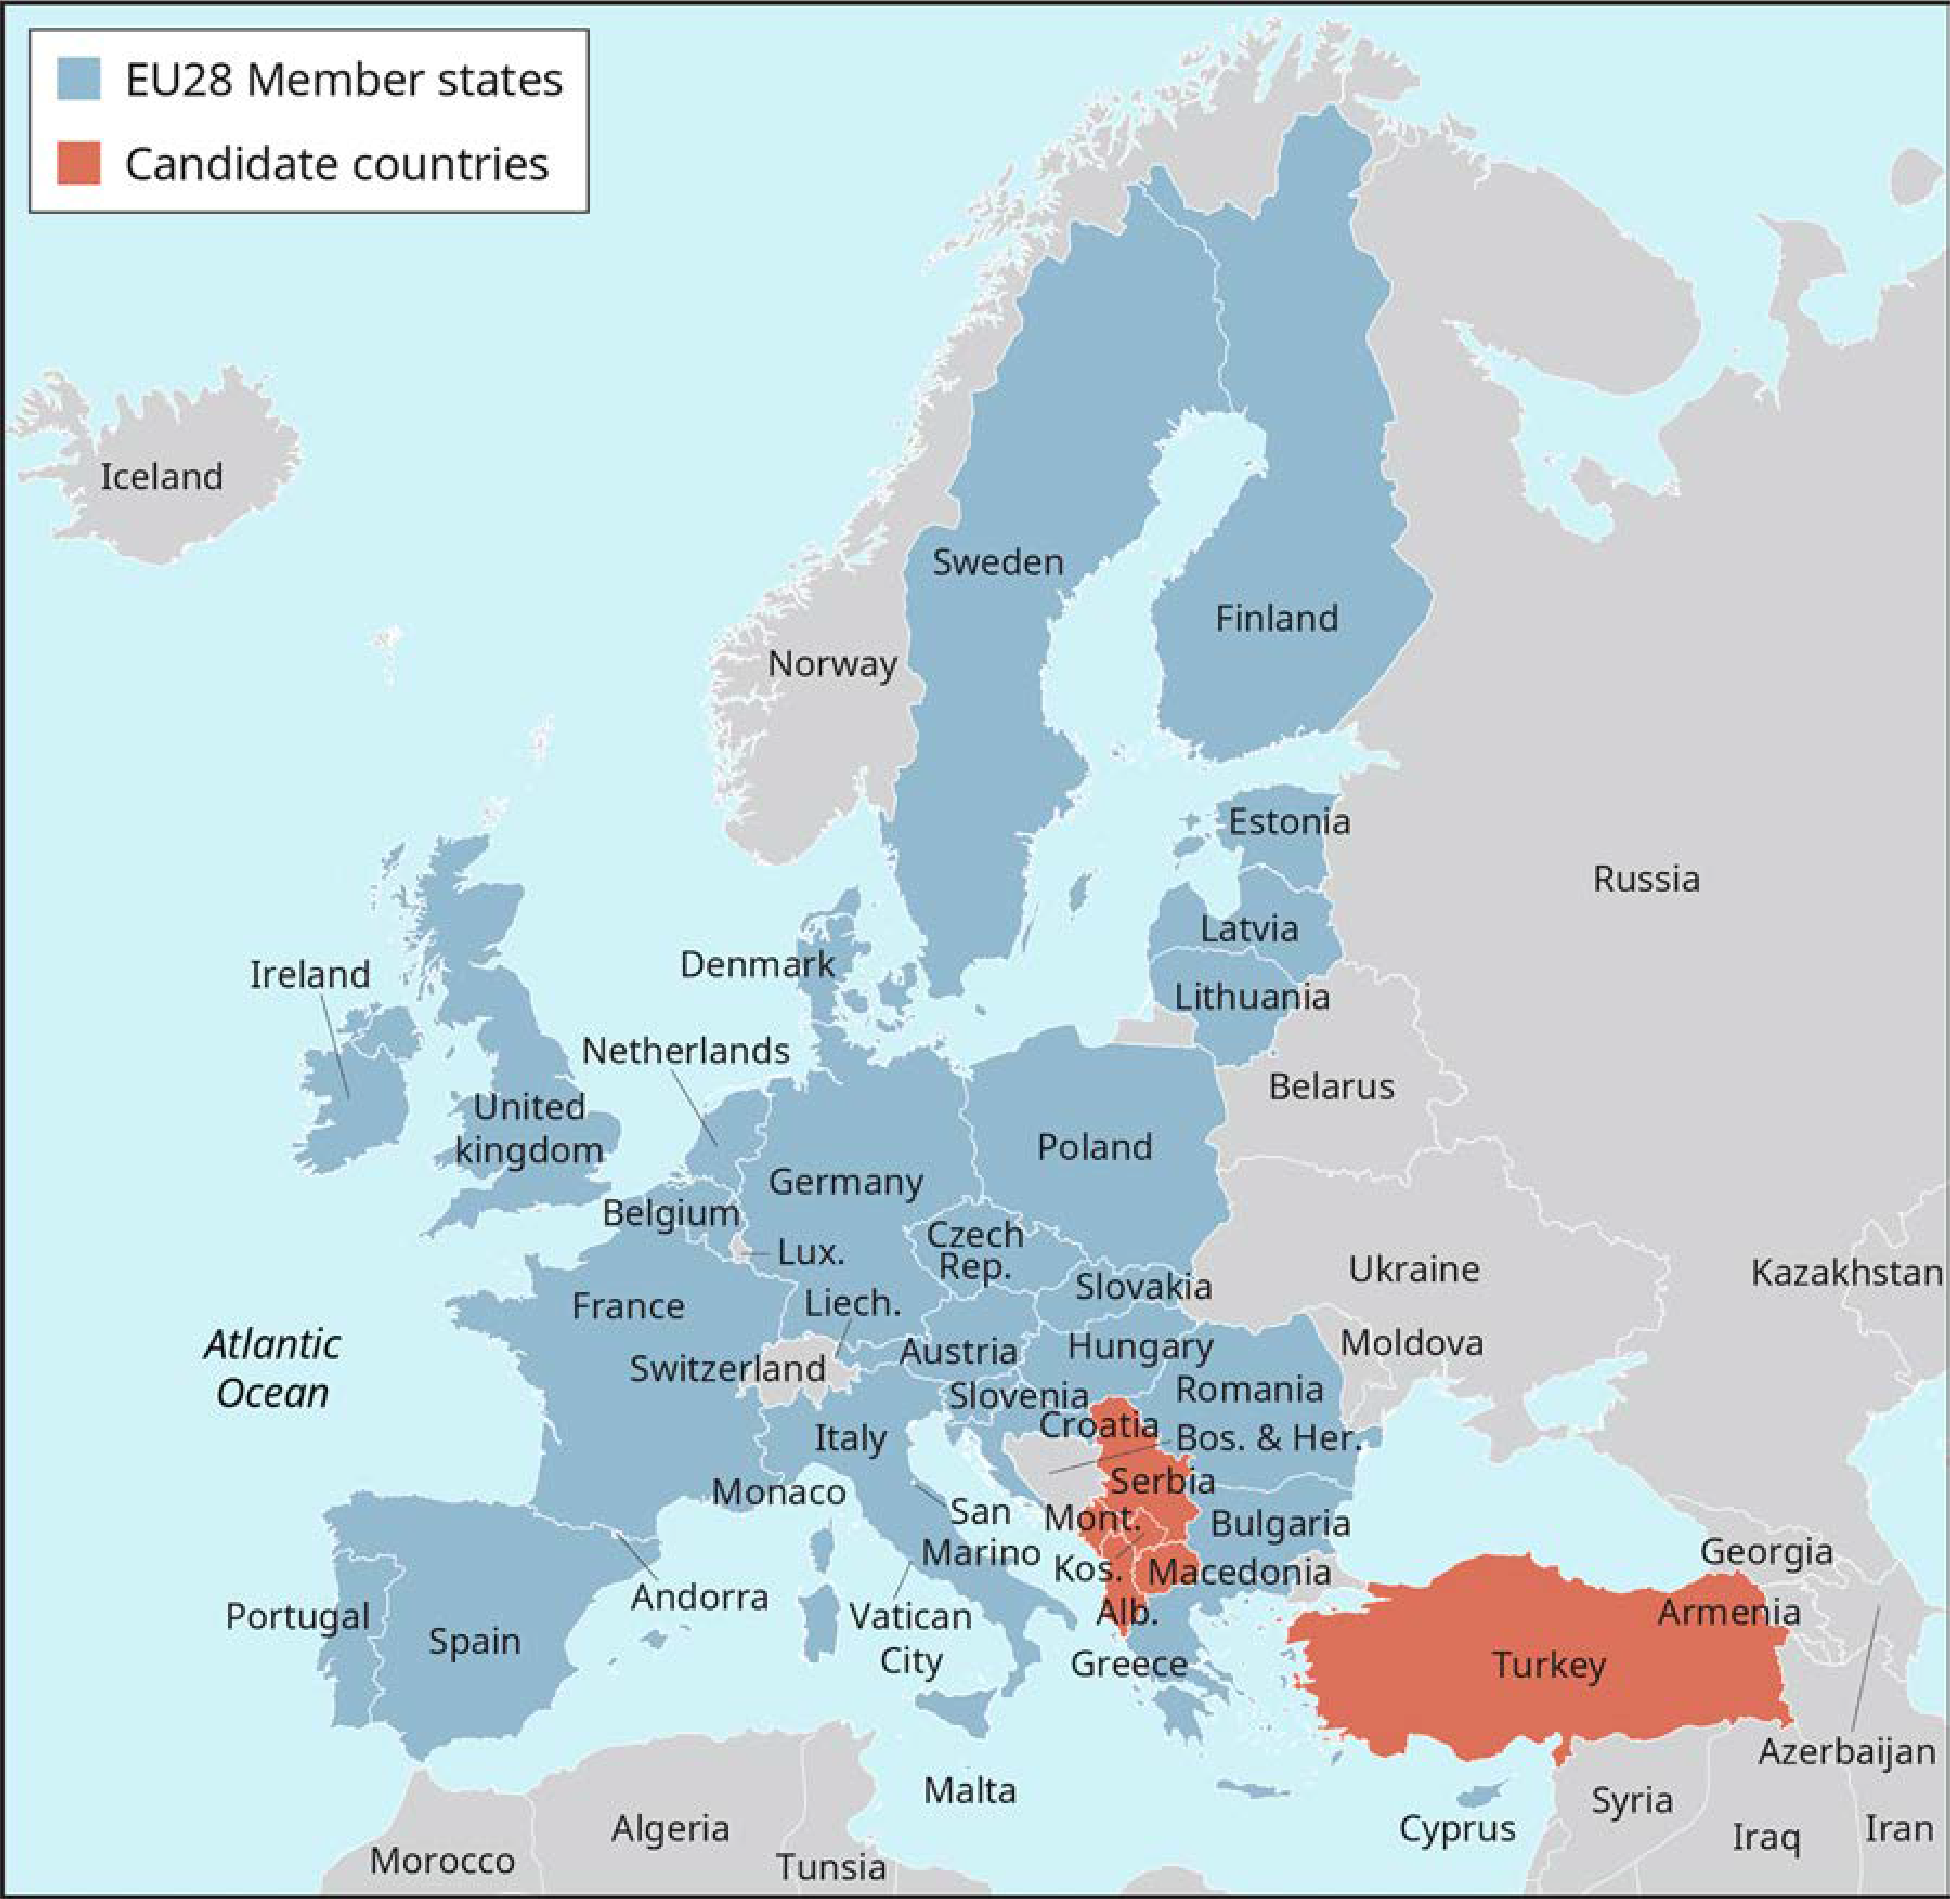 Exemplu 3.2 Uniunea Europeană Sursa: Adaptat de la https://europa.eu/european-union/about-eu/countries/member-countries_en.